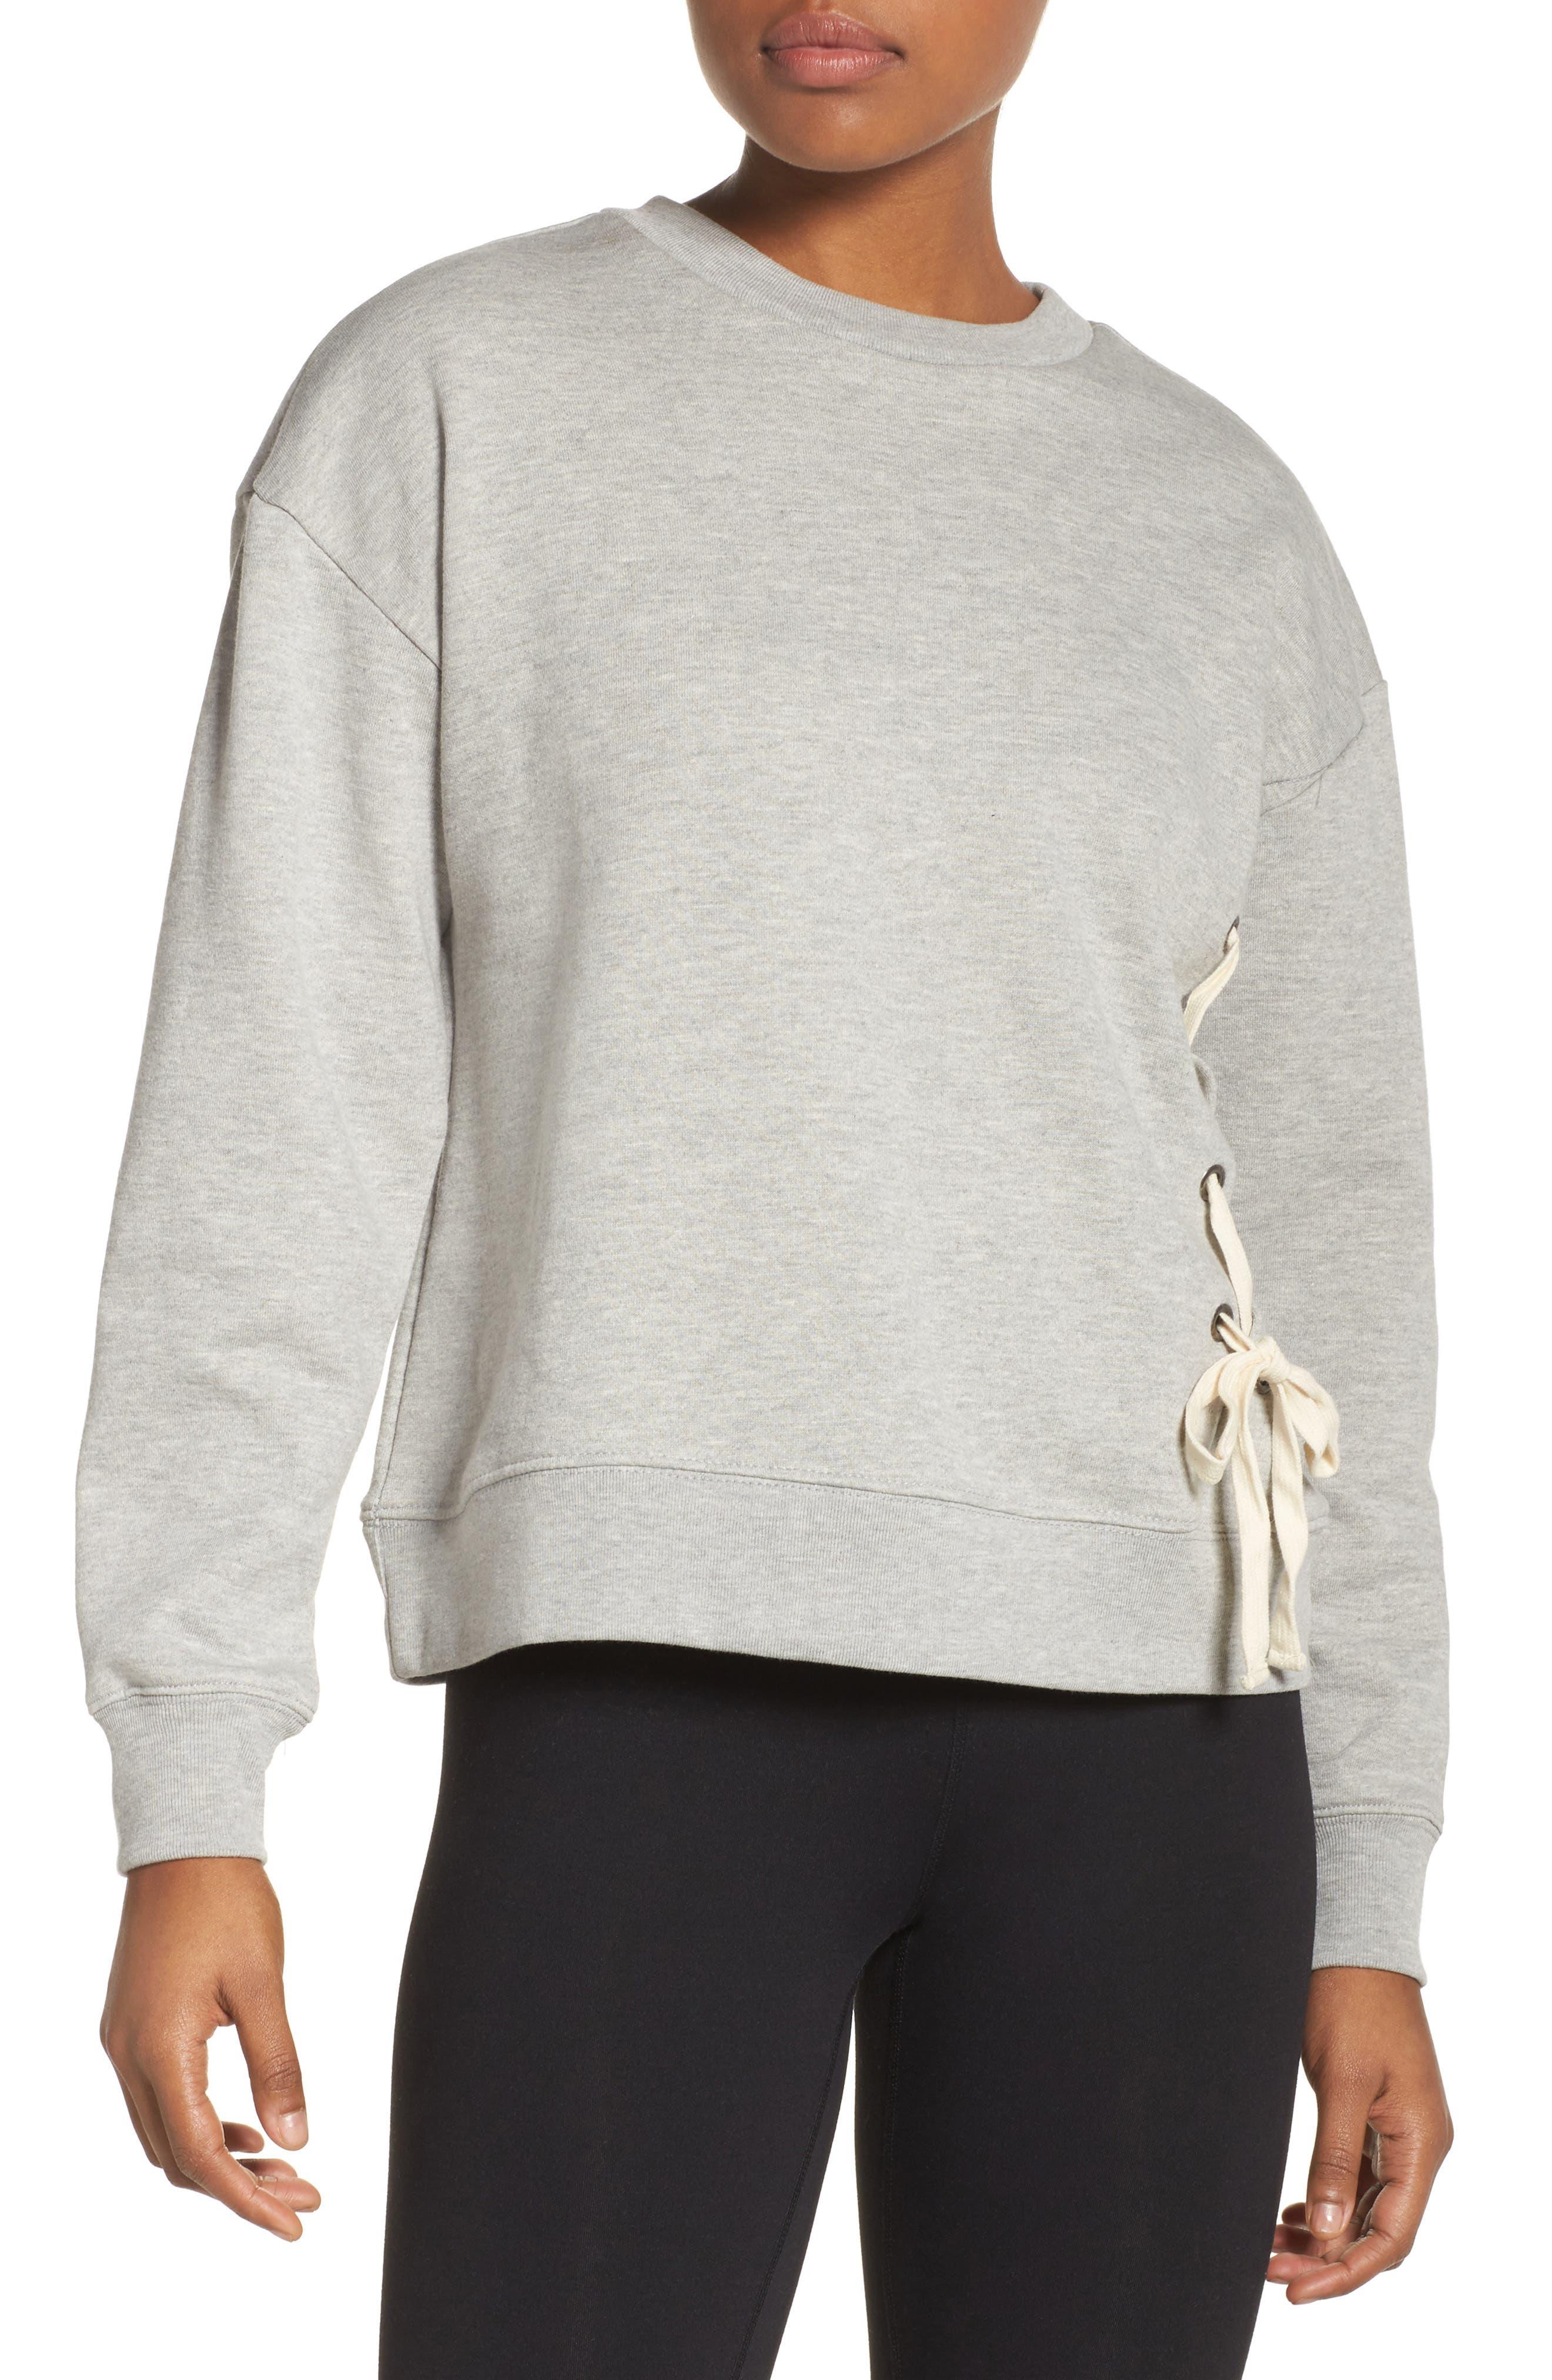 Lace-Up Crewneck Sweatshirt,                             Main thumbnail 1, color,                             Grey Heather